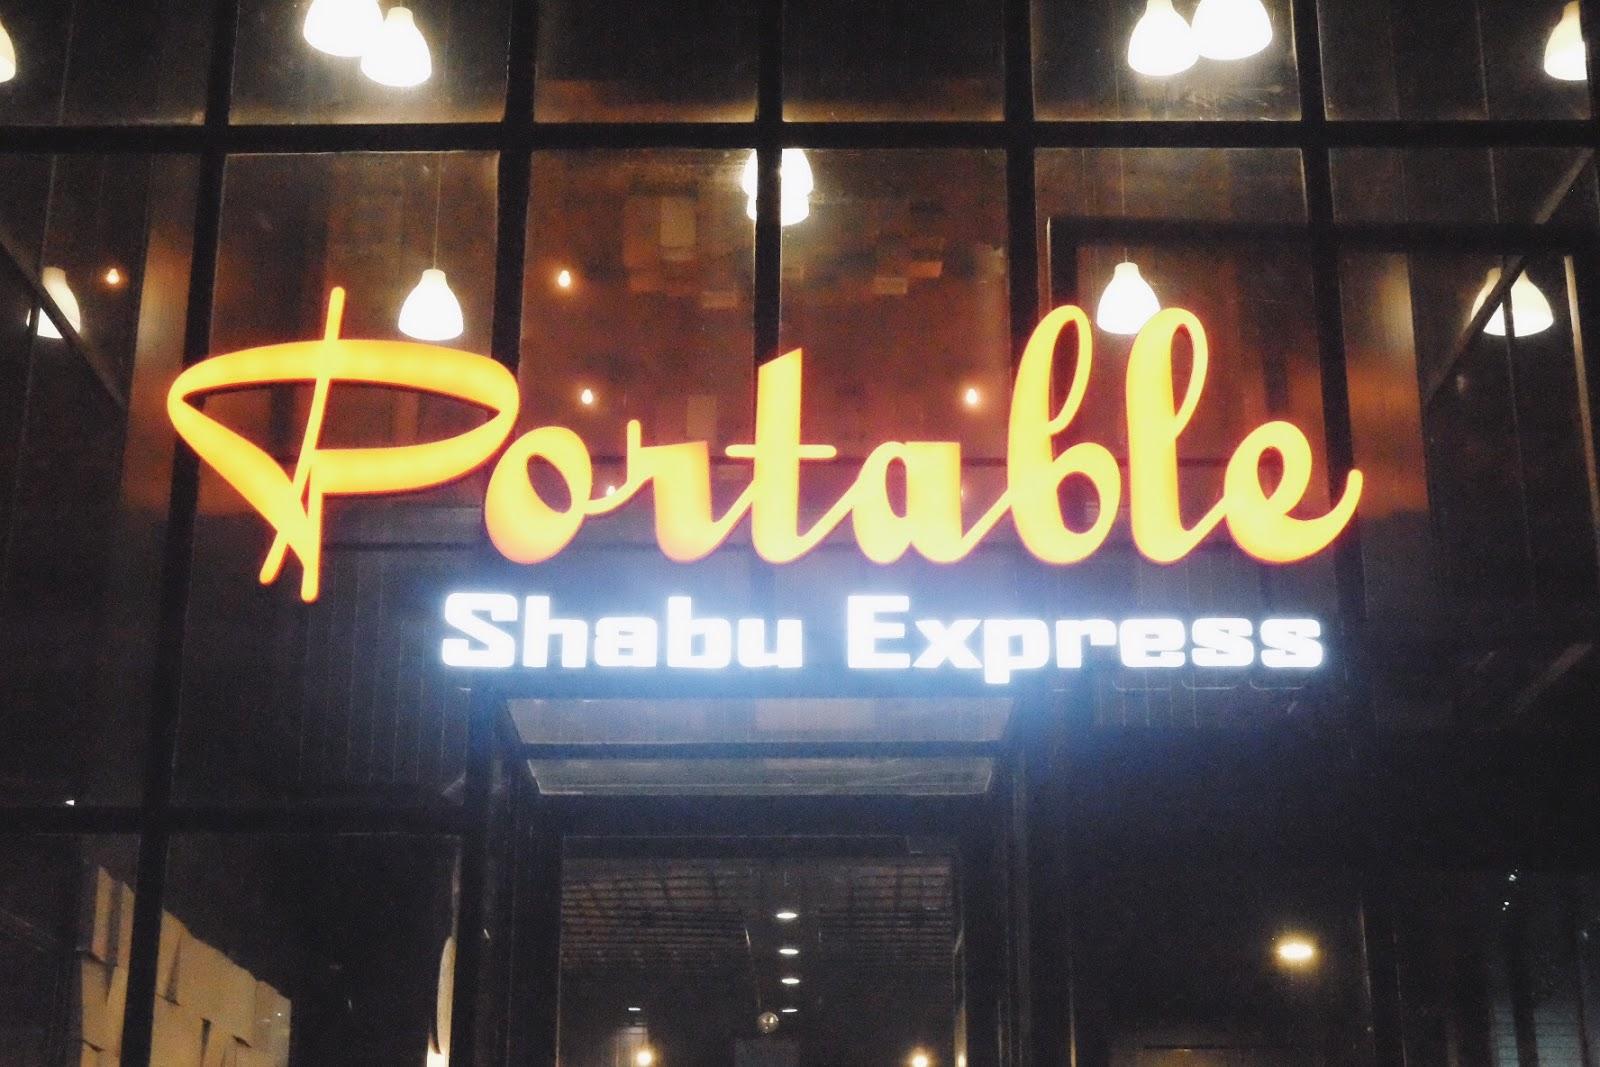 Portable Shabu Express